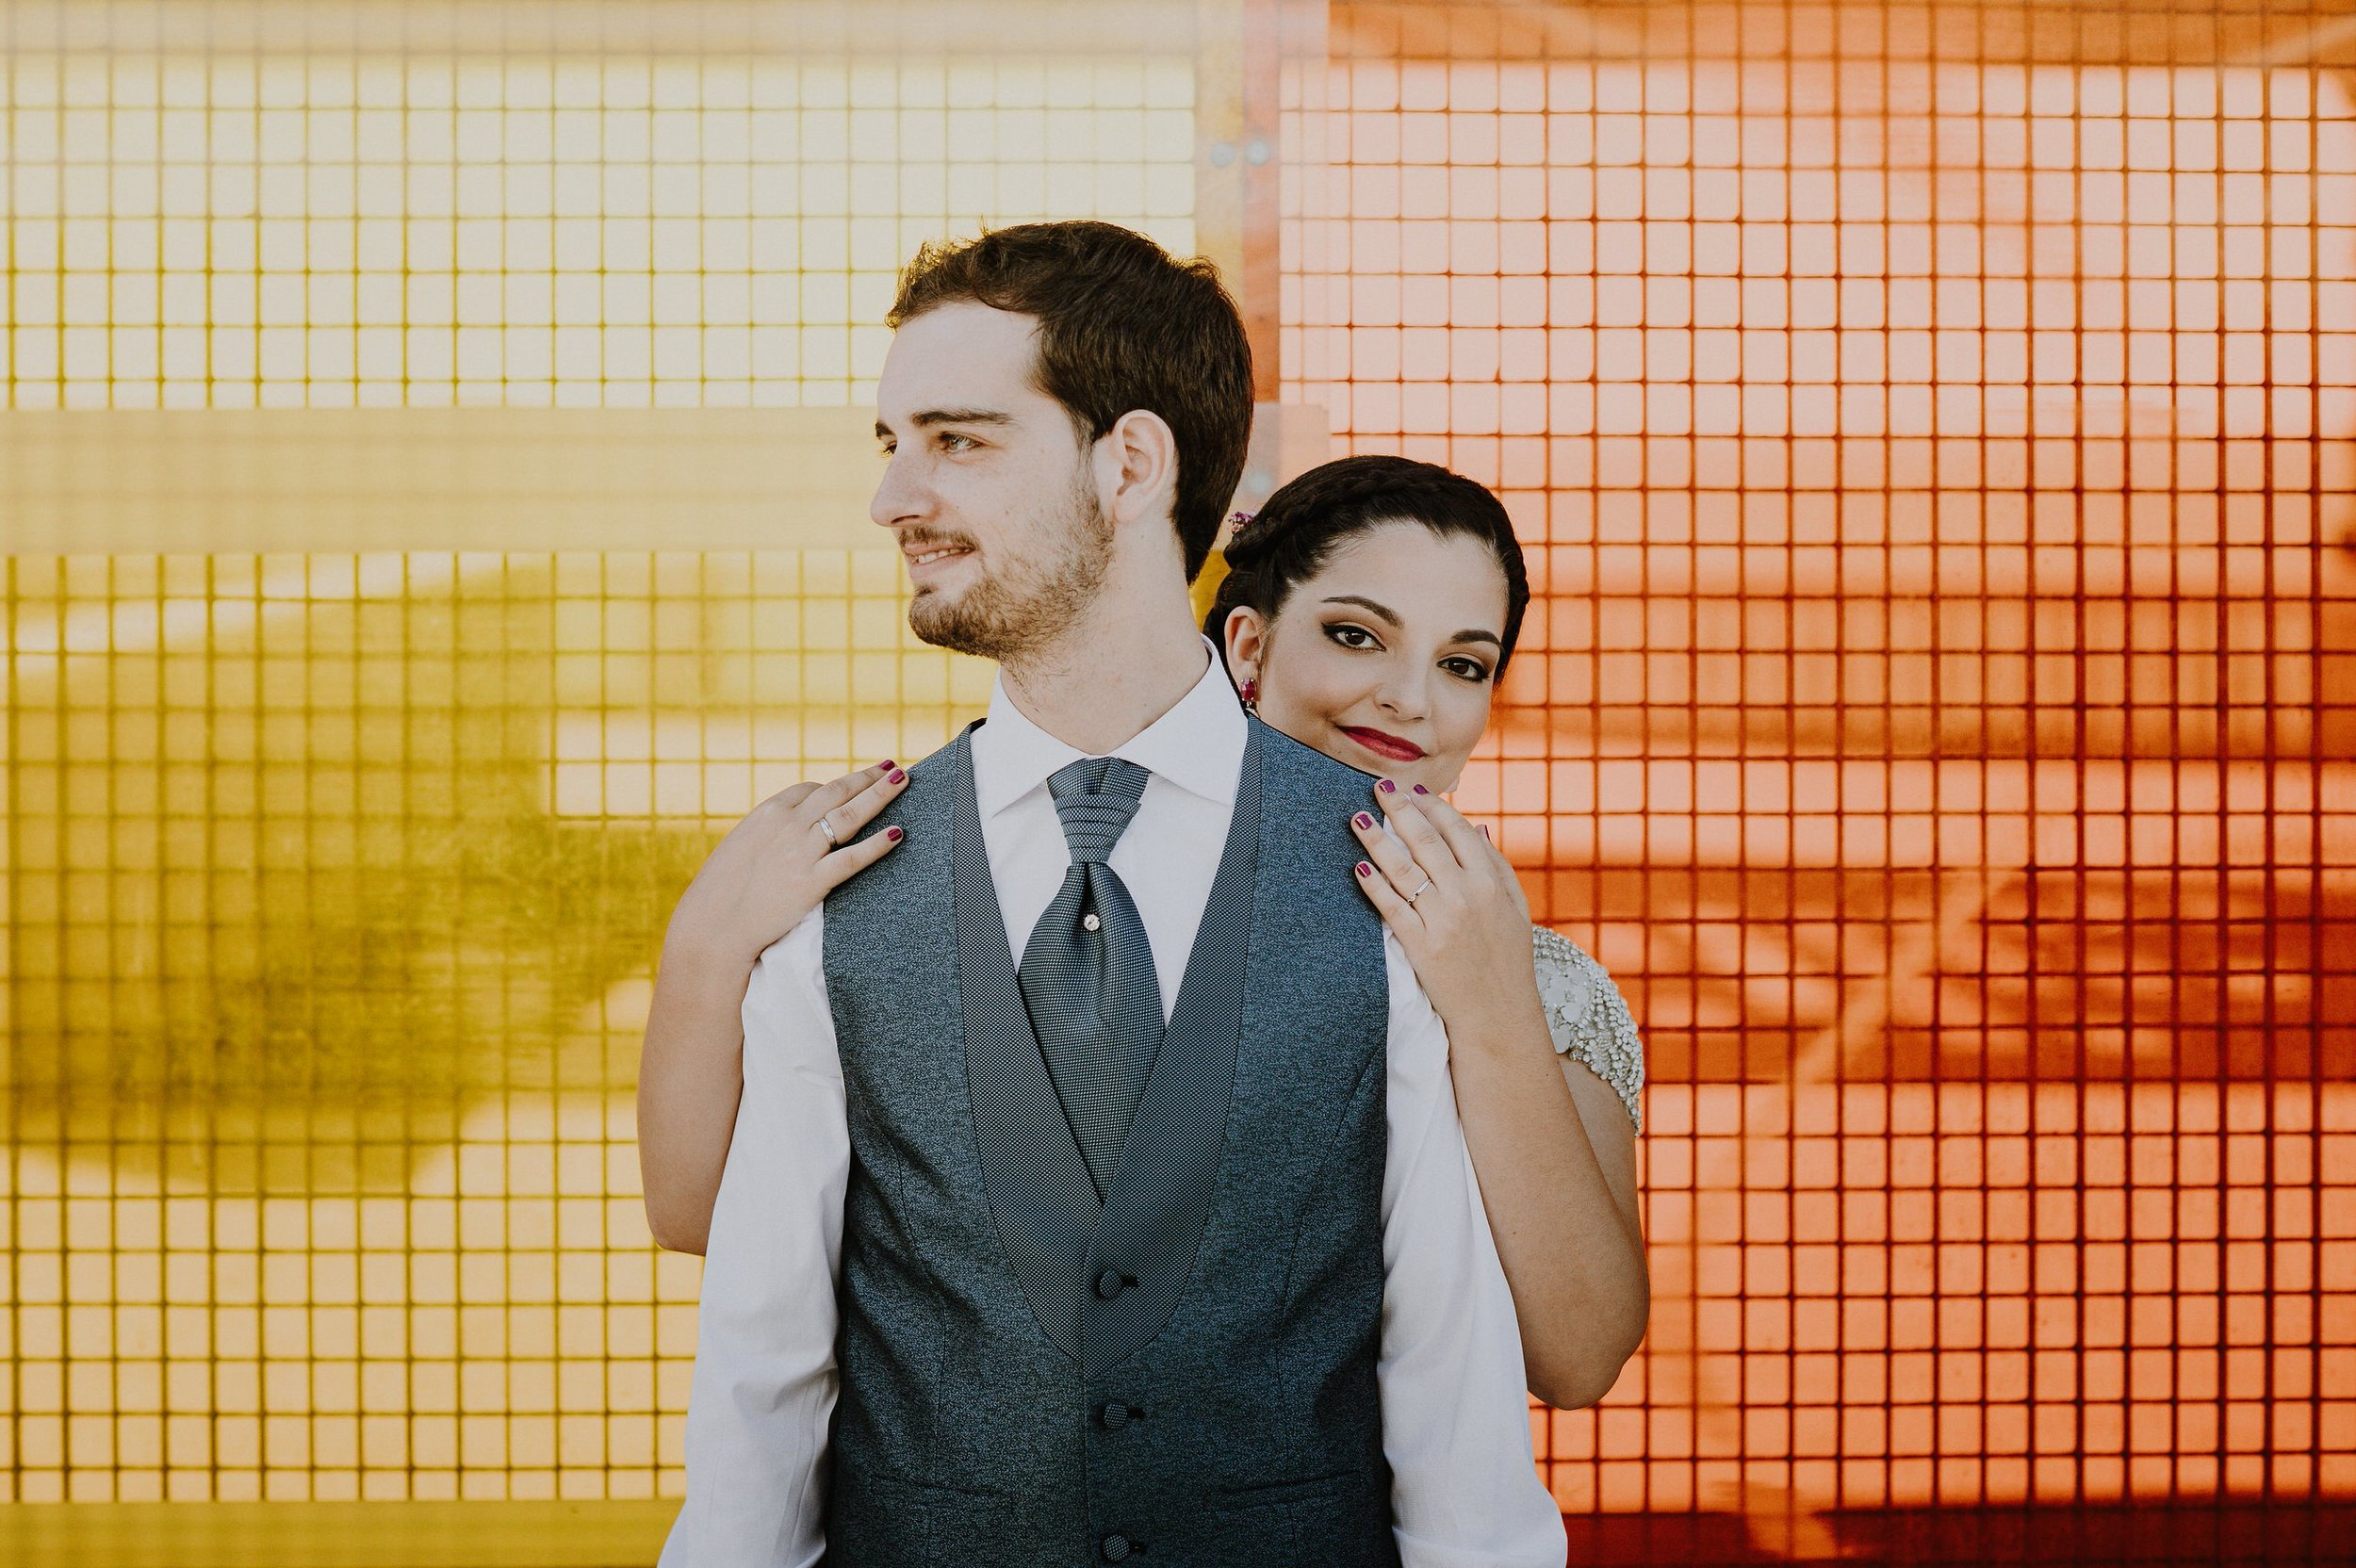 Laura & Rubén - boda en utrera - Santa clotilde- Manolo mayo - Fotografo de boda - Andrés Amarillo AAA_1075-Exposure (102).jpg